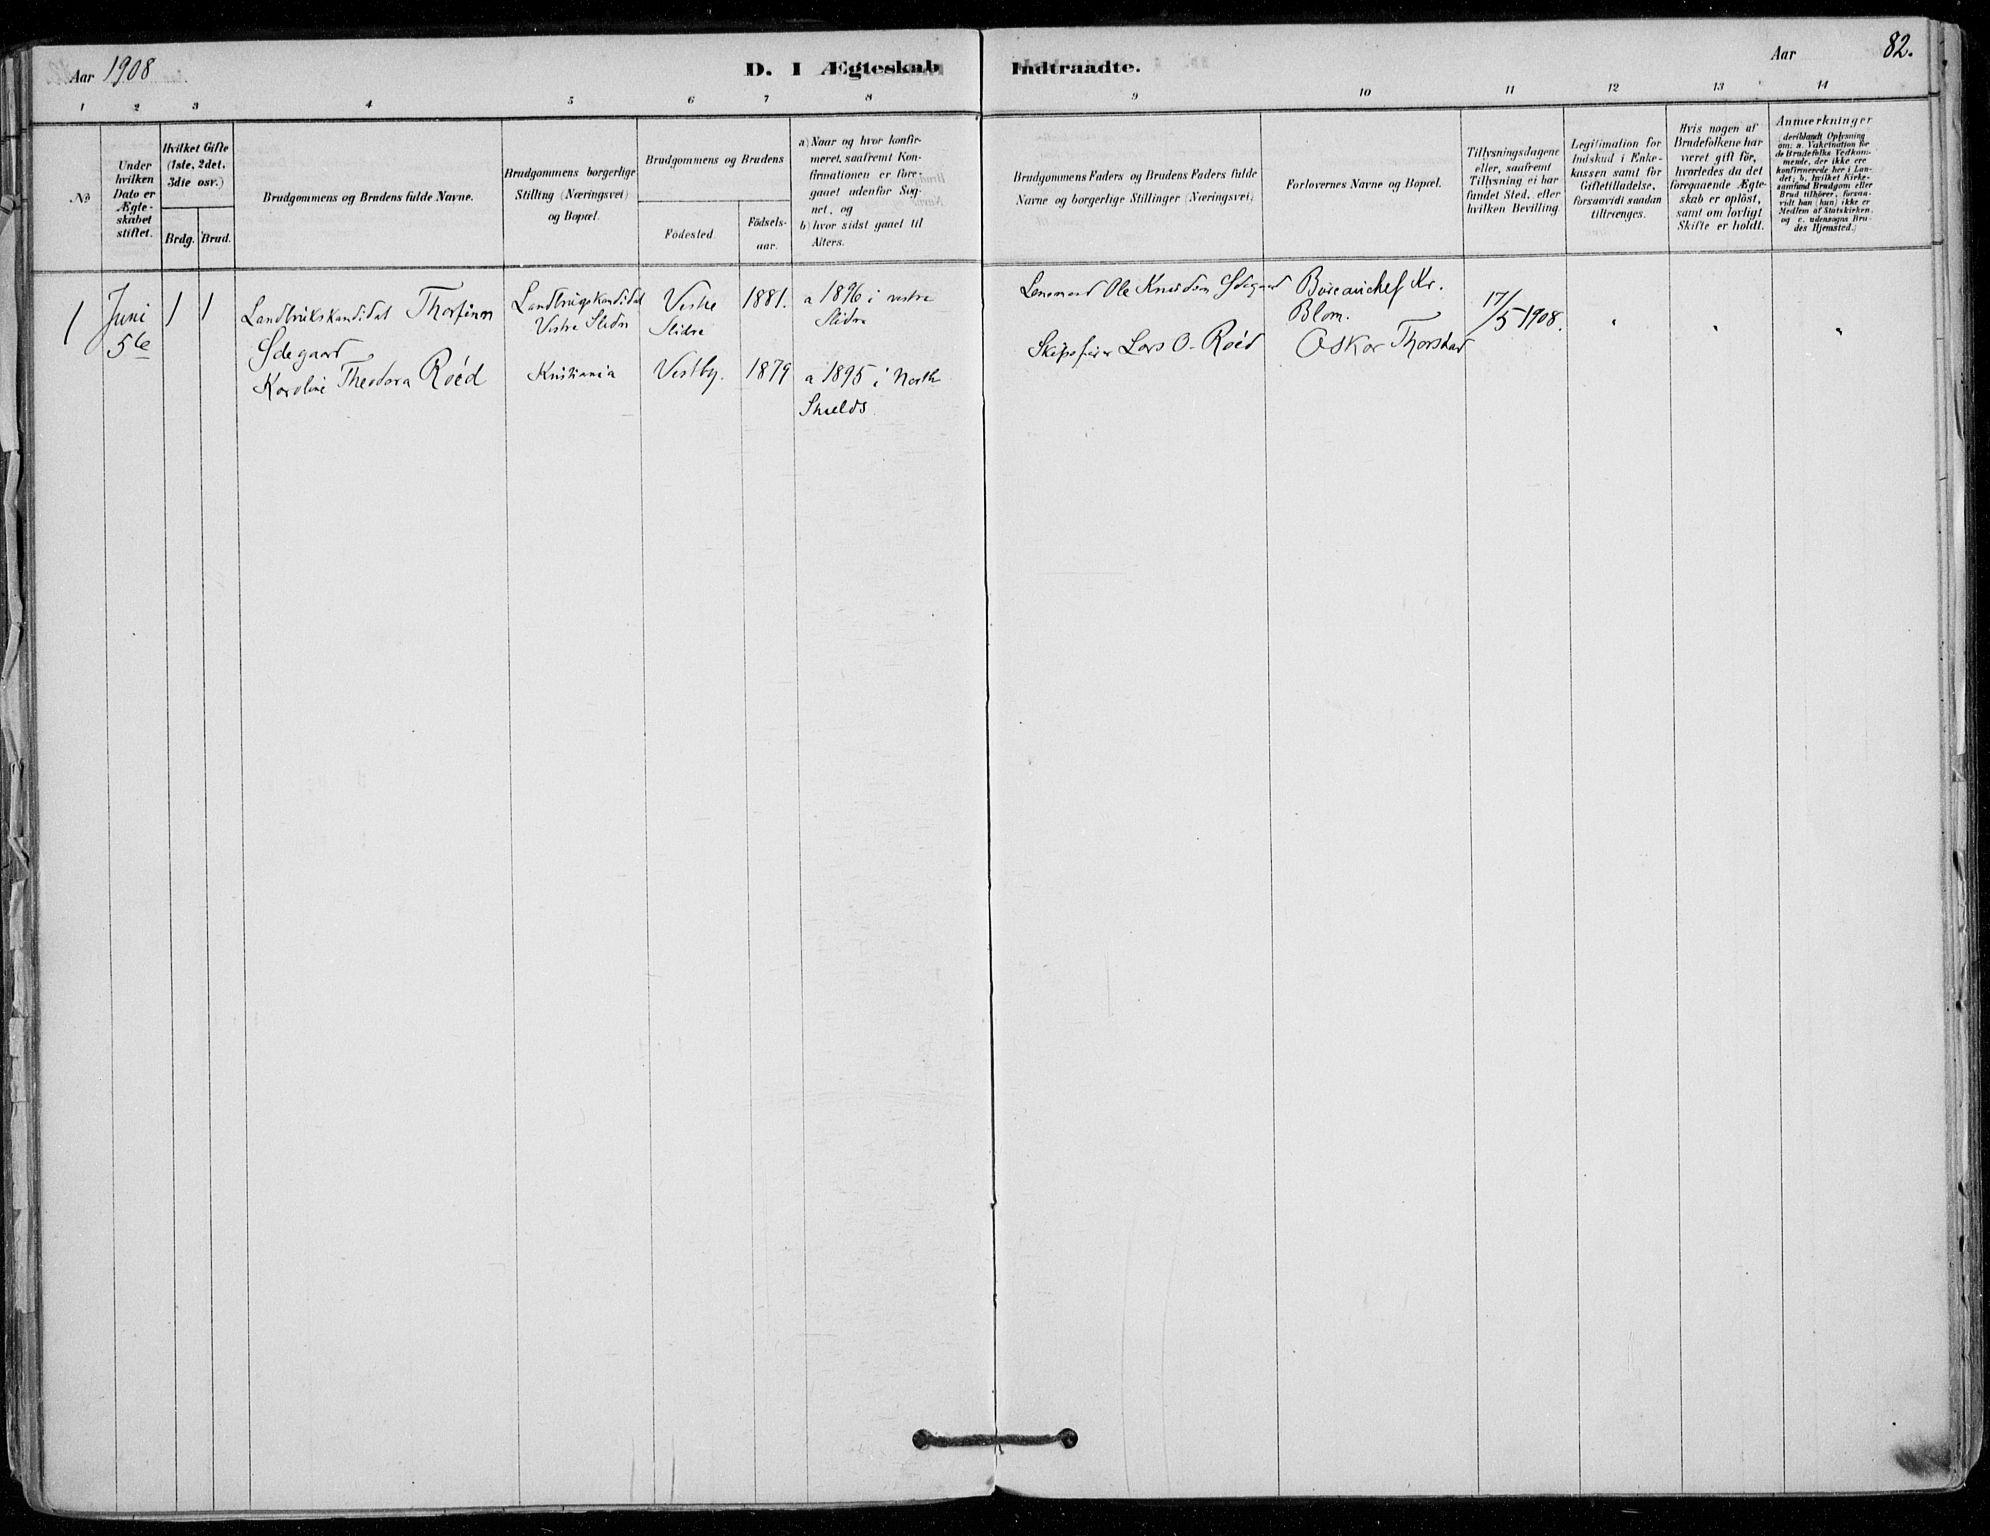 SAO, Vestby prestekontor Kirkebøker, F/Fd/L0001: Ministerialbok nr. IV 1, 1878-1945, s. 82